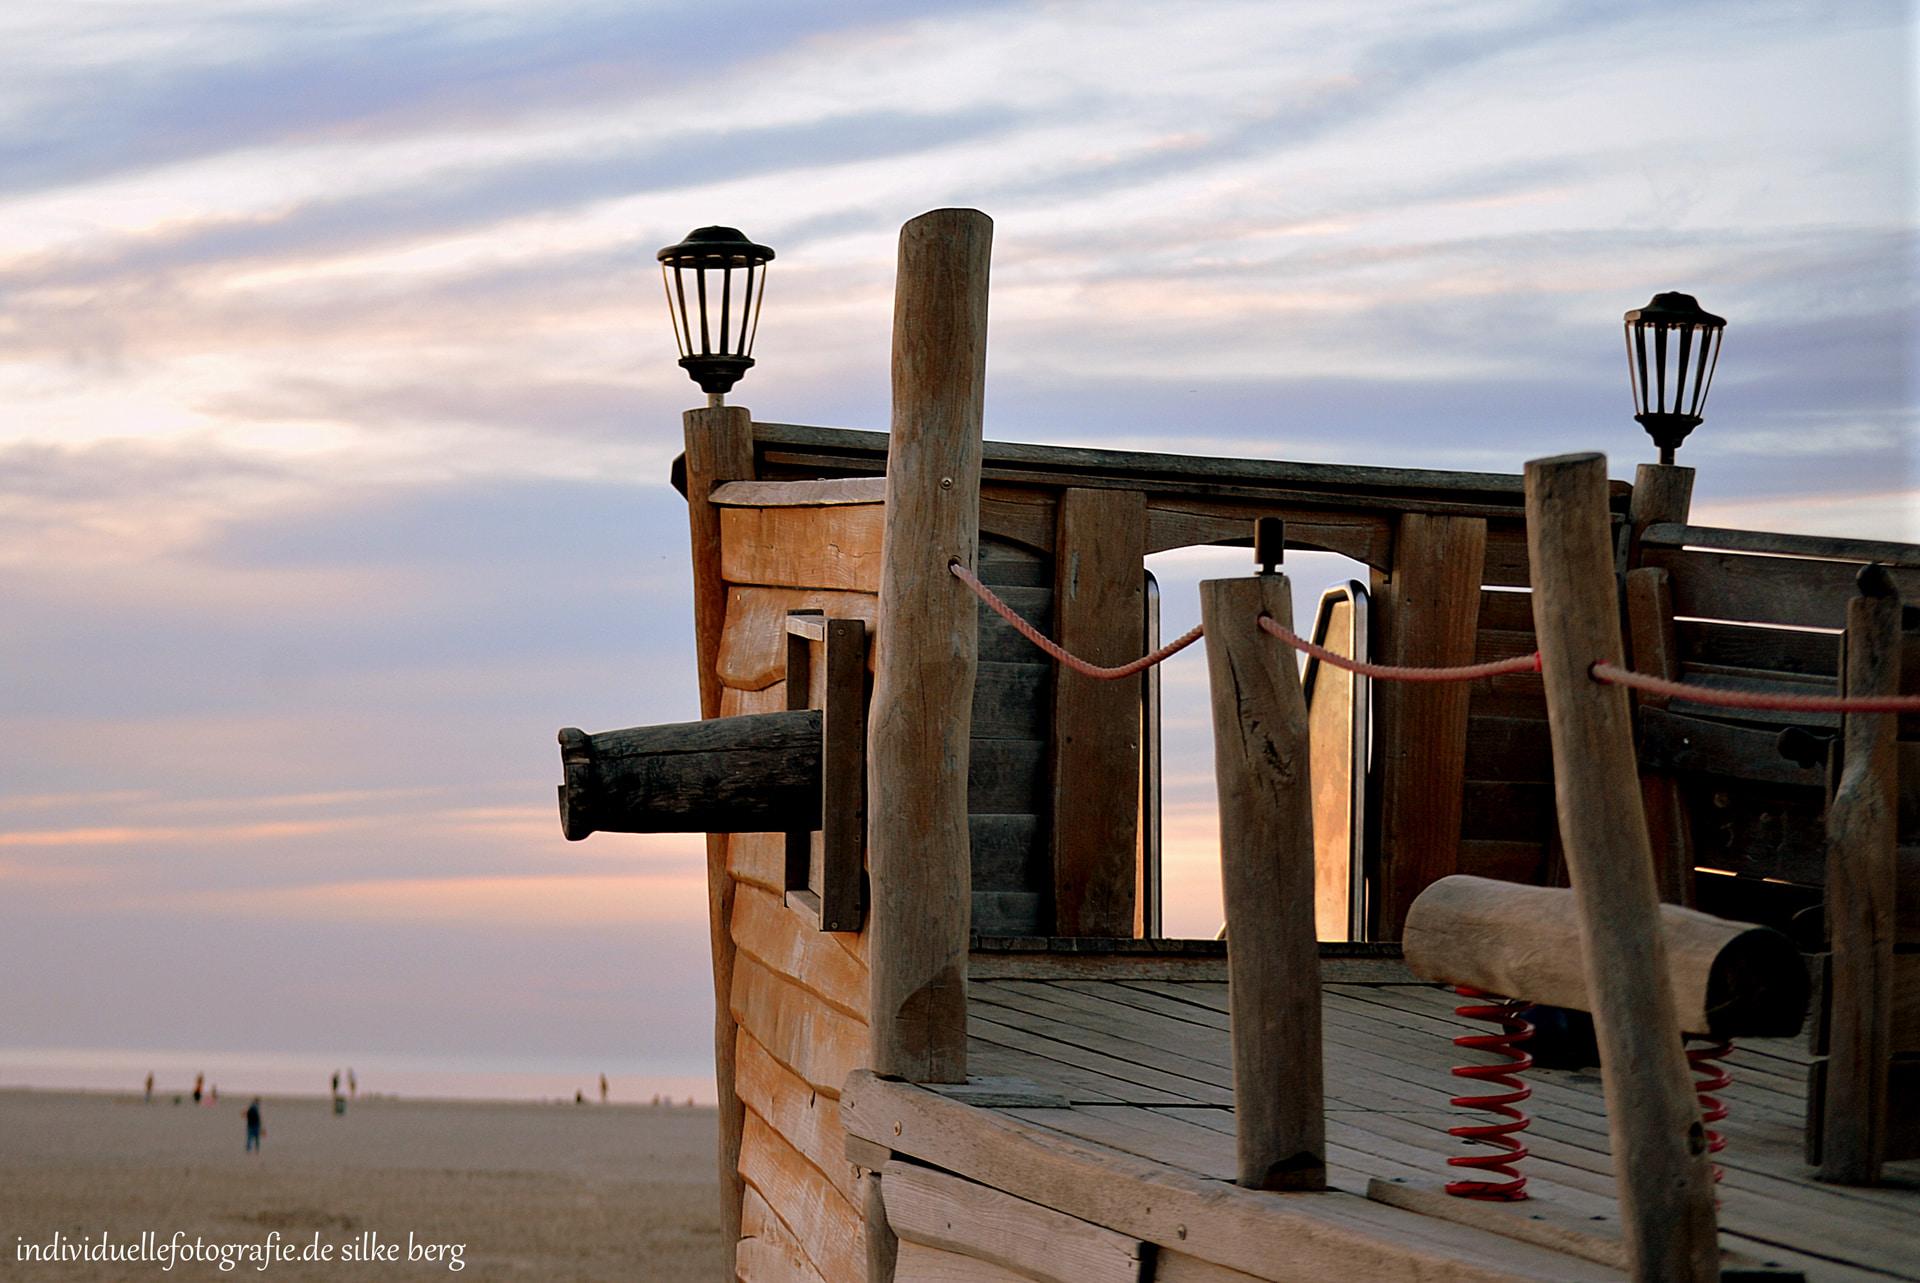 Strand, Meerliebe, Nordsee, Natur, Fotografien, Fotografin, Offenburg, Silke Berg